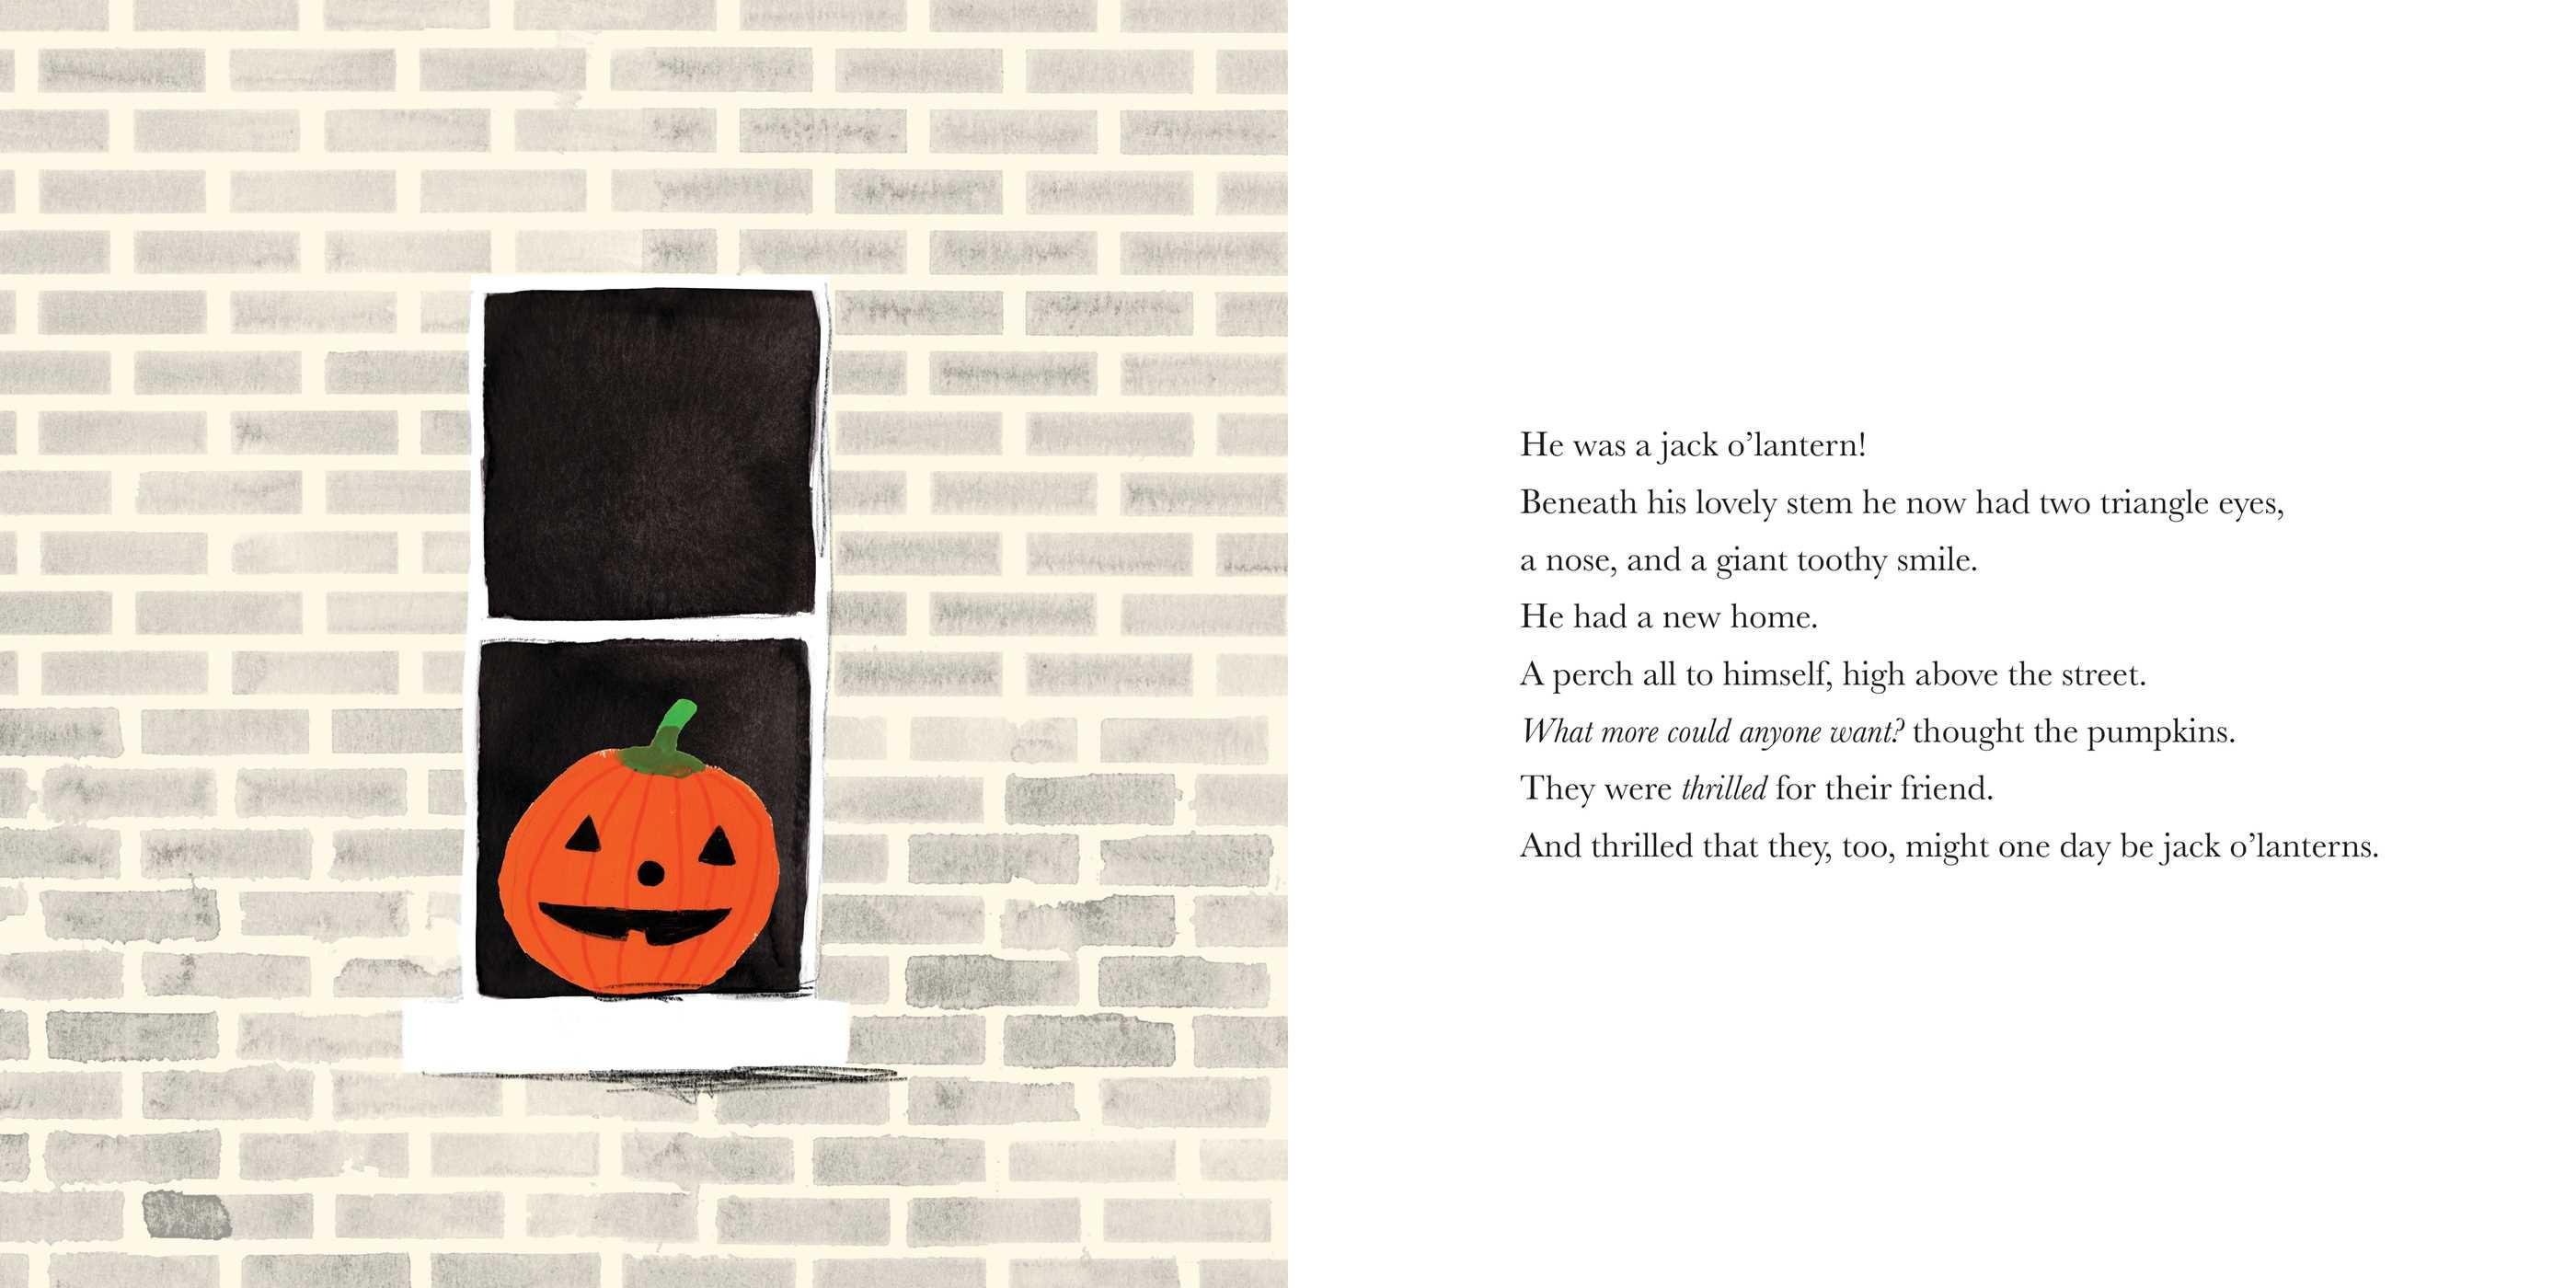 Stumpkin 9781534413627.in04